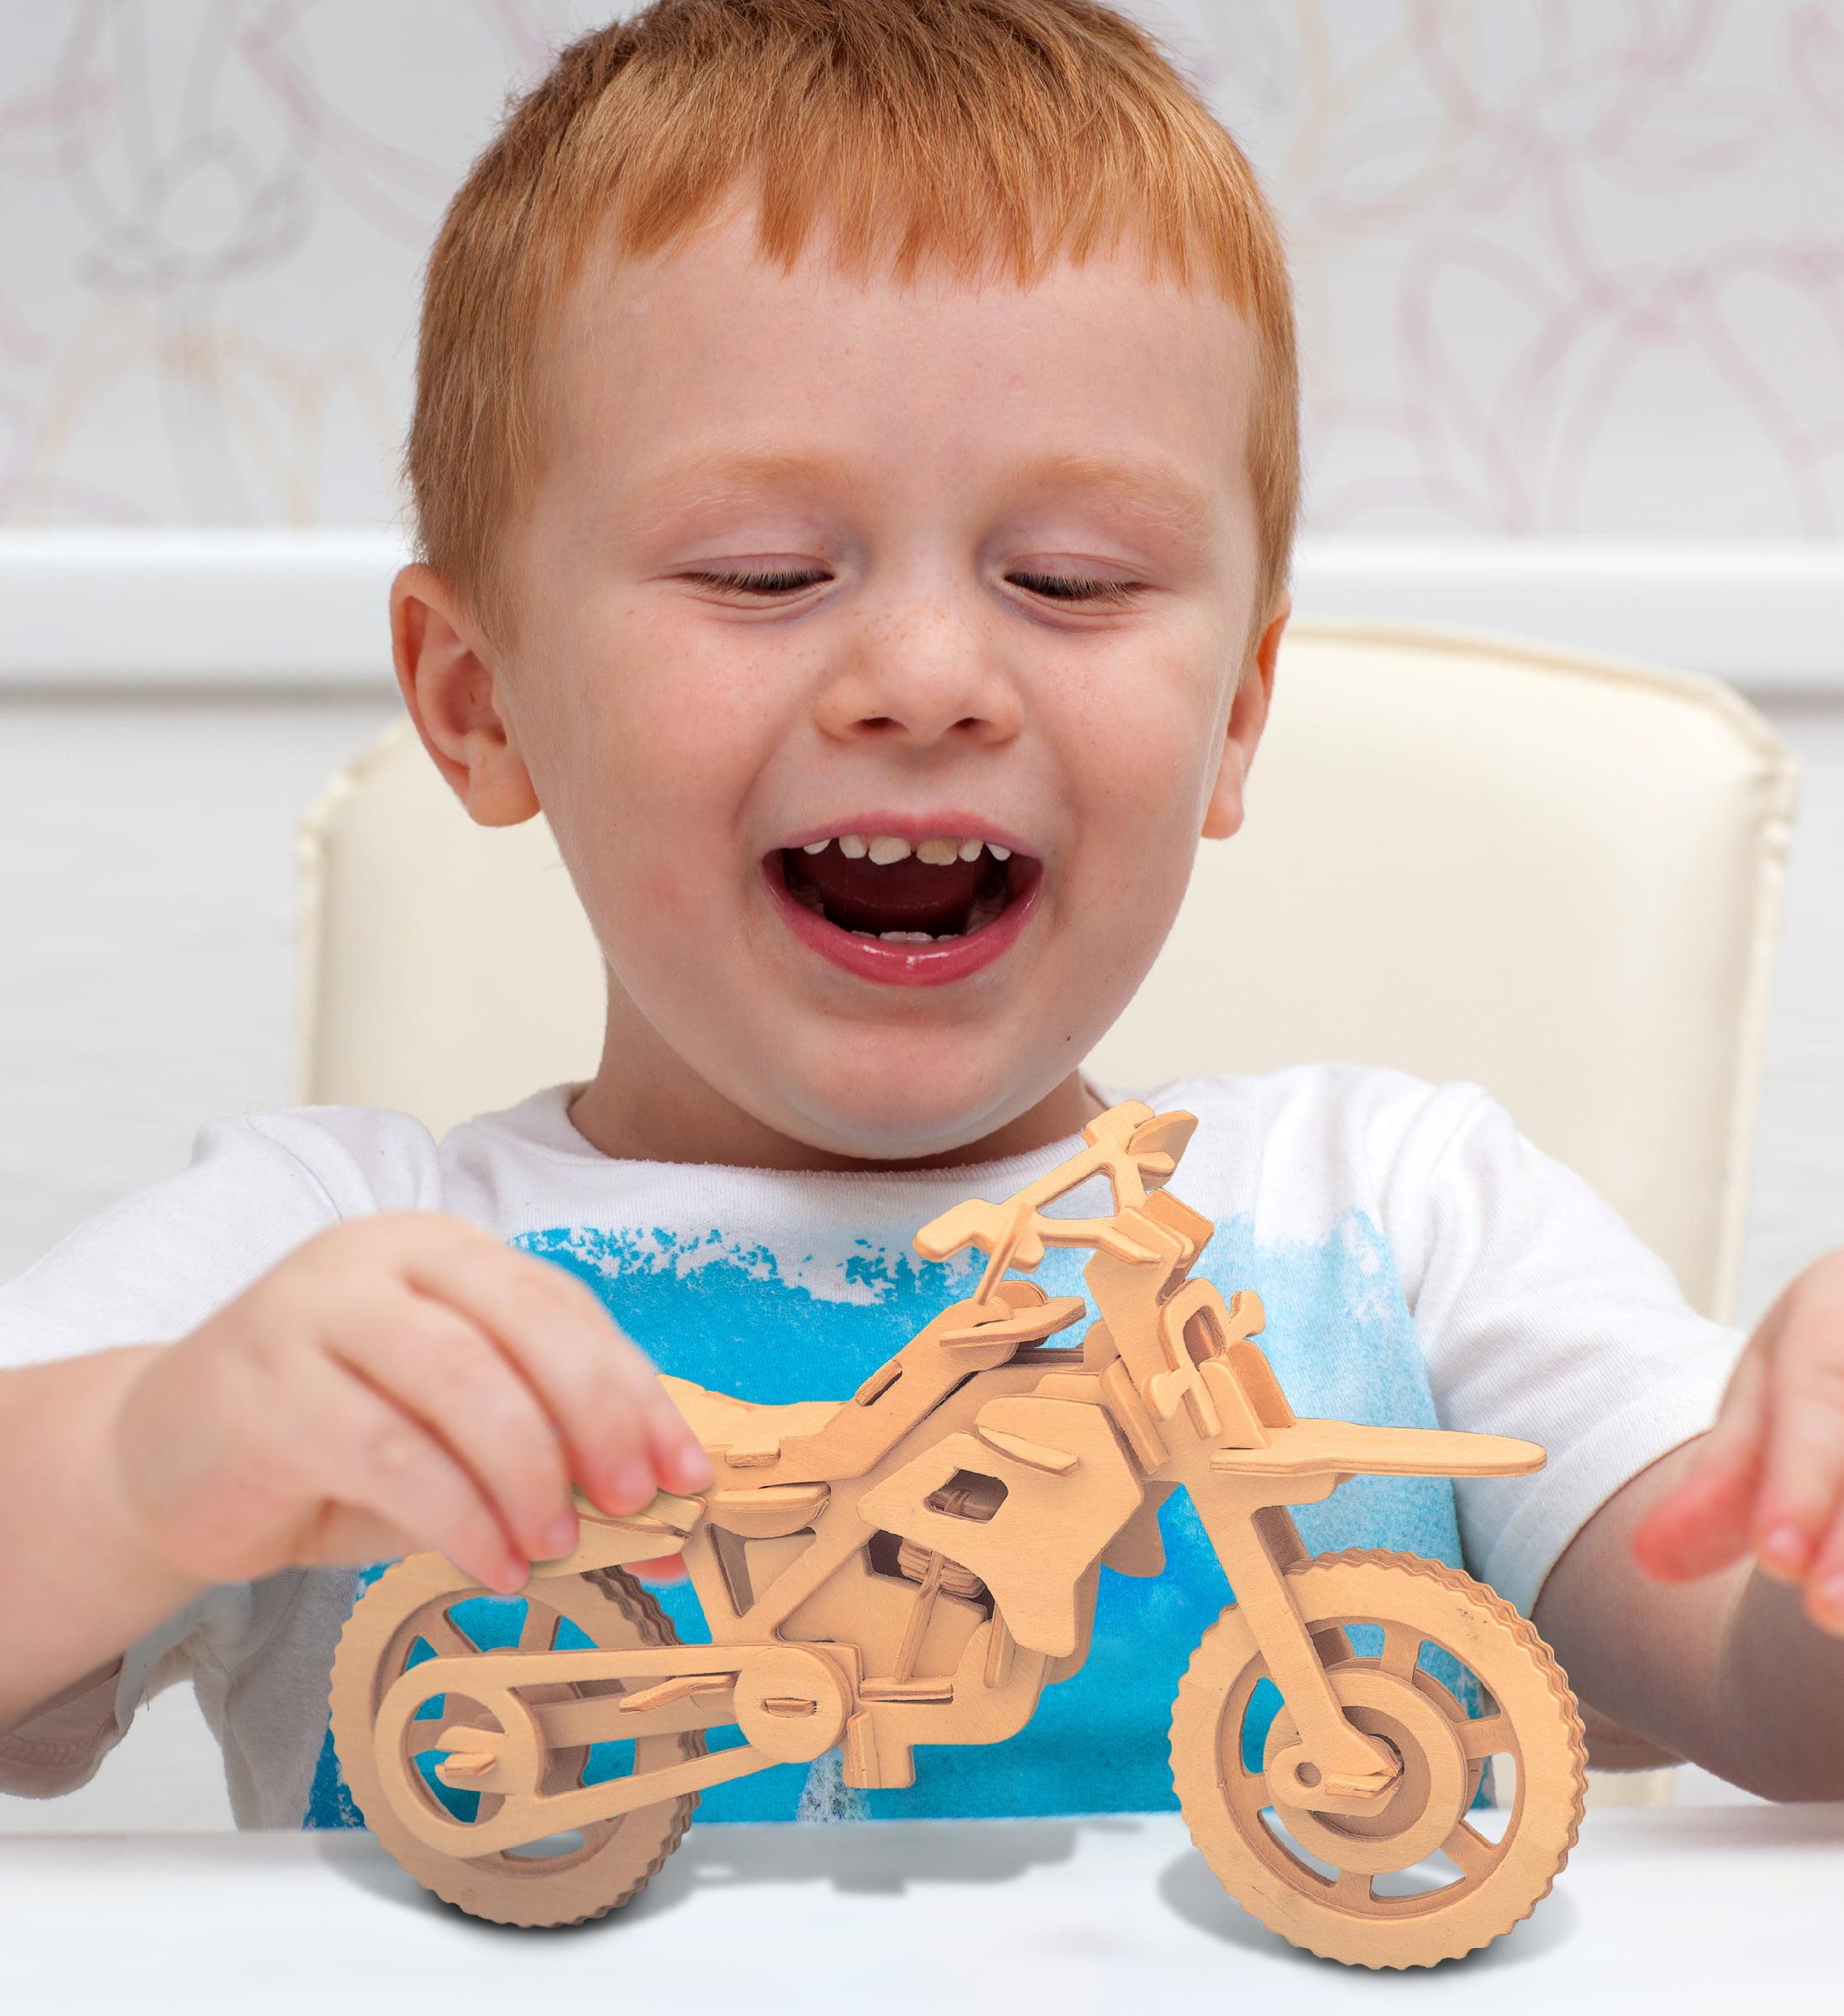 DIY Car 3D Wooden Modelling Kit Model Woodcraft Jigsaw Puzzles Children Toys